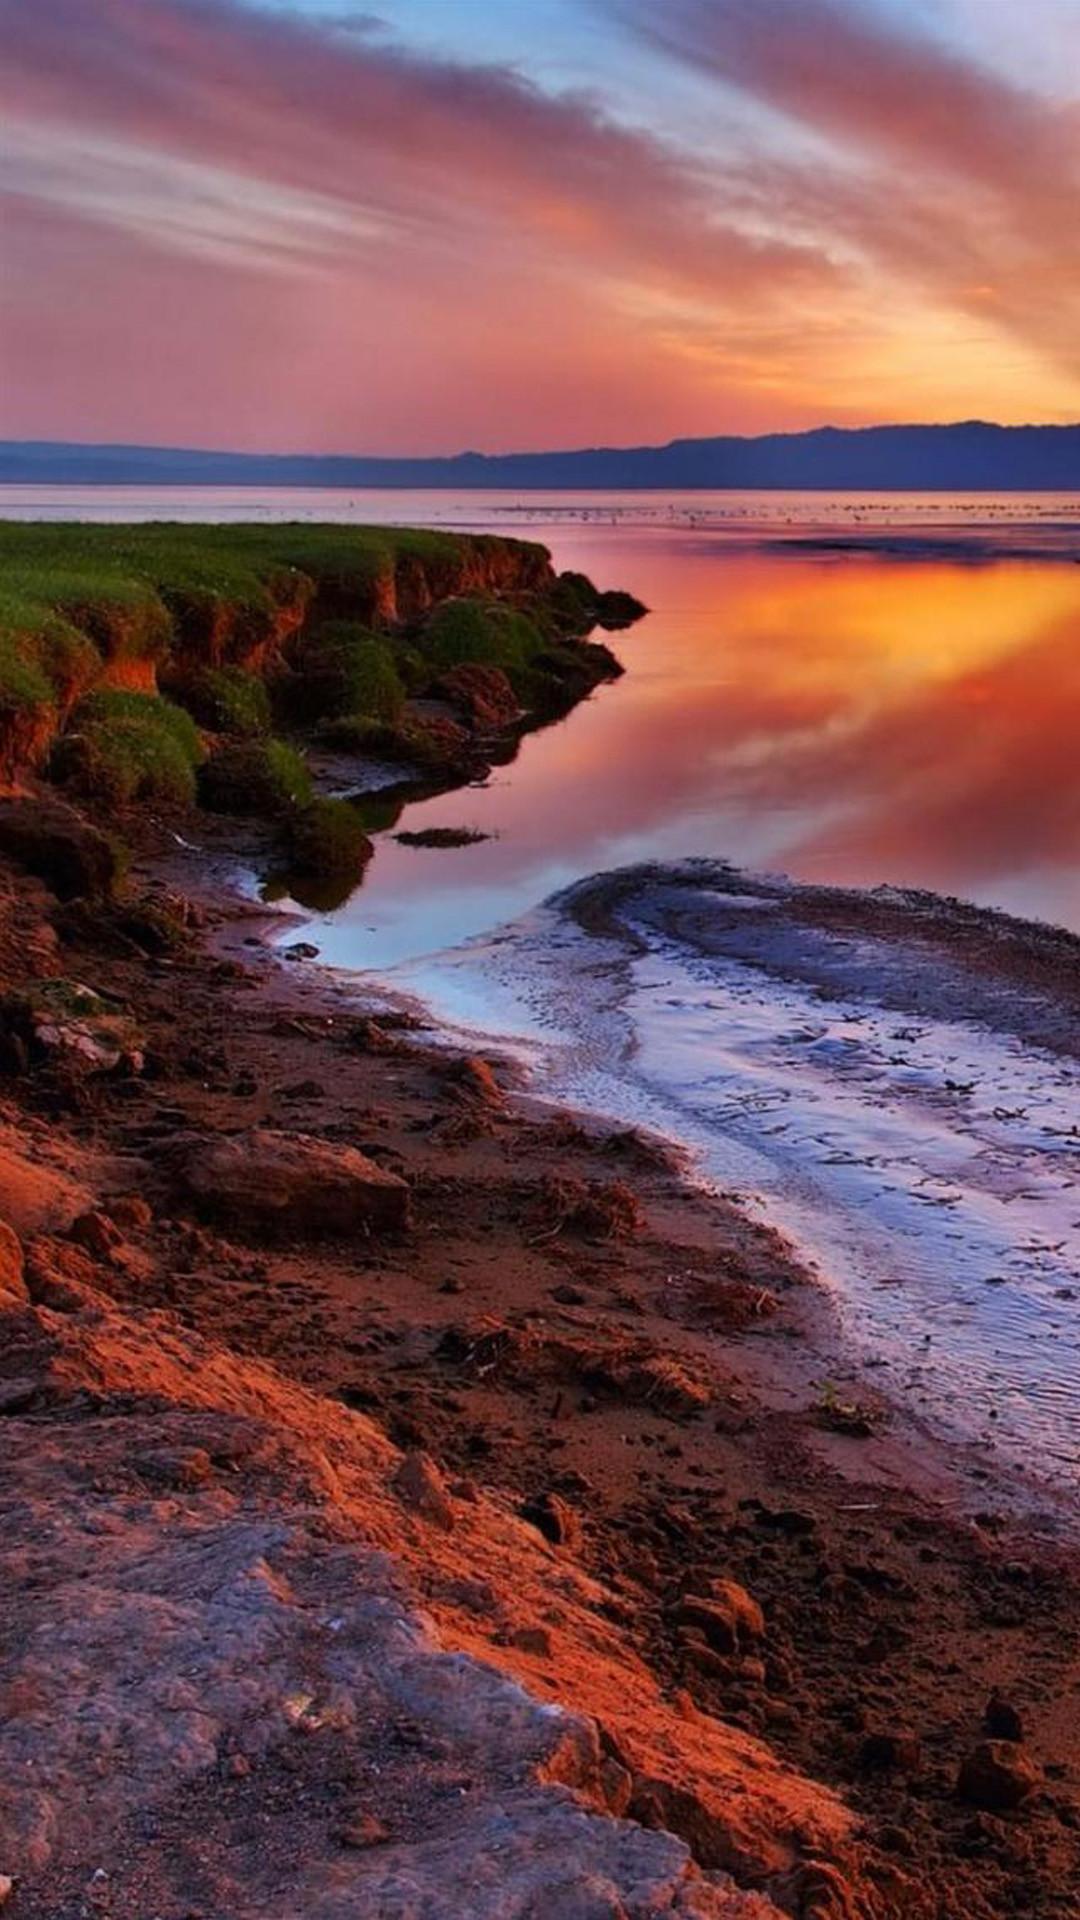 iphone 6 plus wallpaper hd nature wwwpixsharkcom